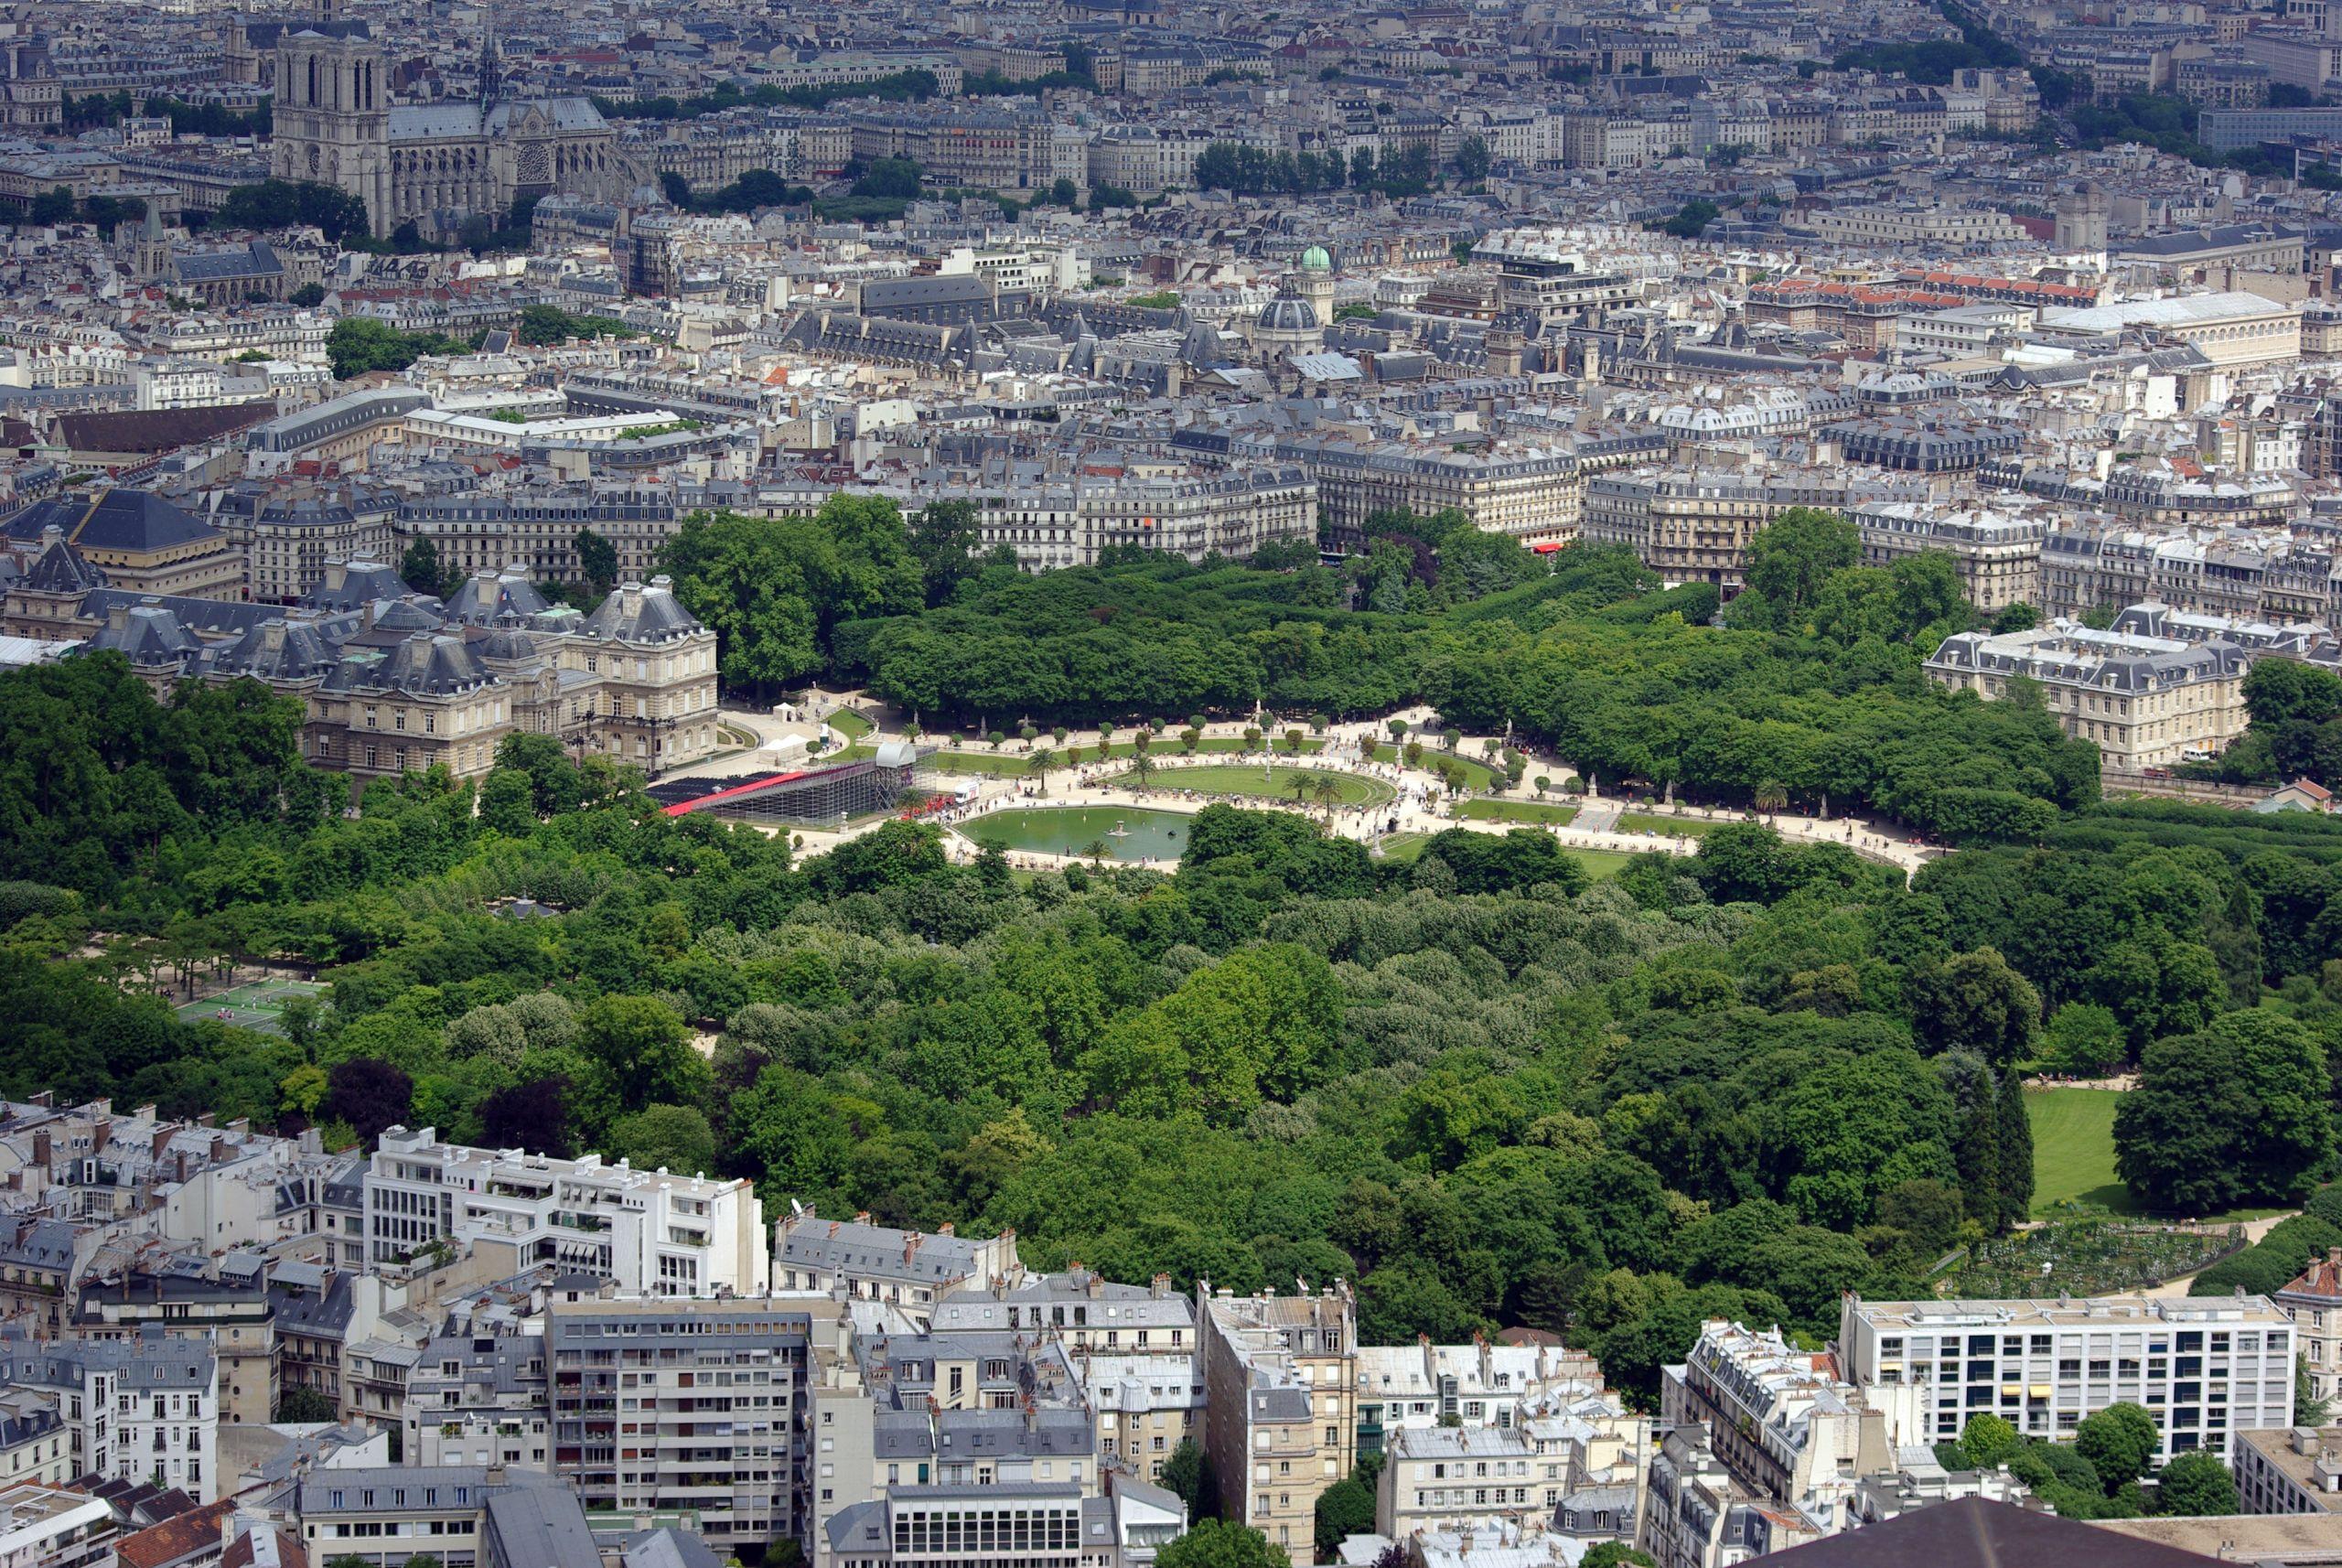 LuxembourgMontparnasse JPG